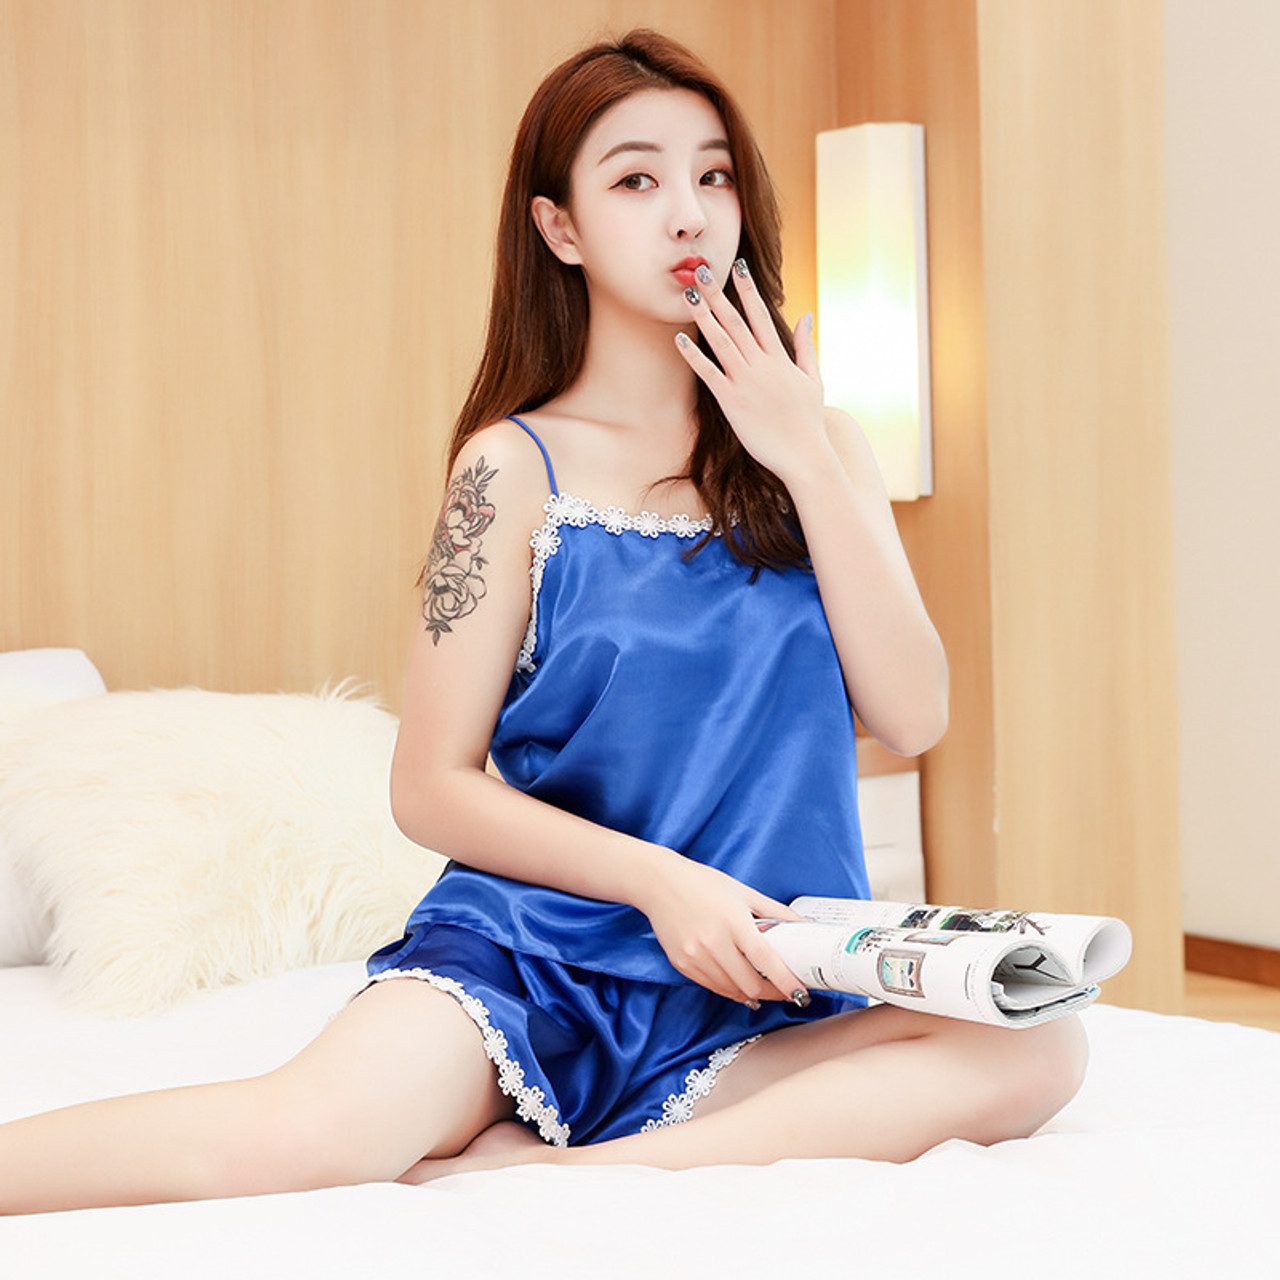 df482a0dbcc ... Ladies Sexy Summer Night Dress Women Satin Lace Sleepwear Silk Nightgown  Sleeveless V-Neck Nightdress ...